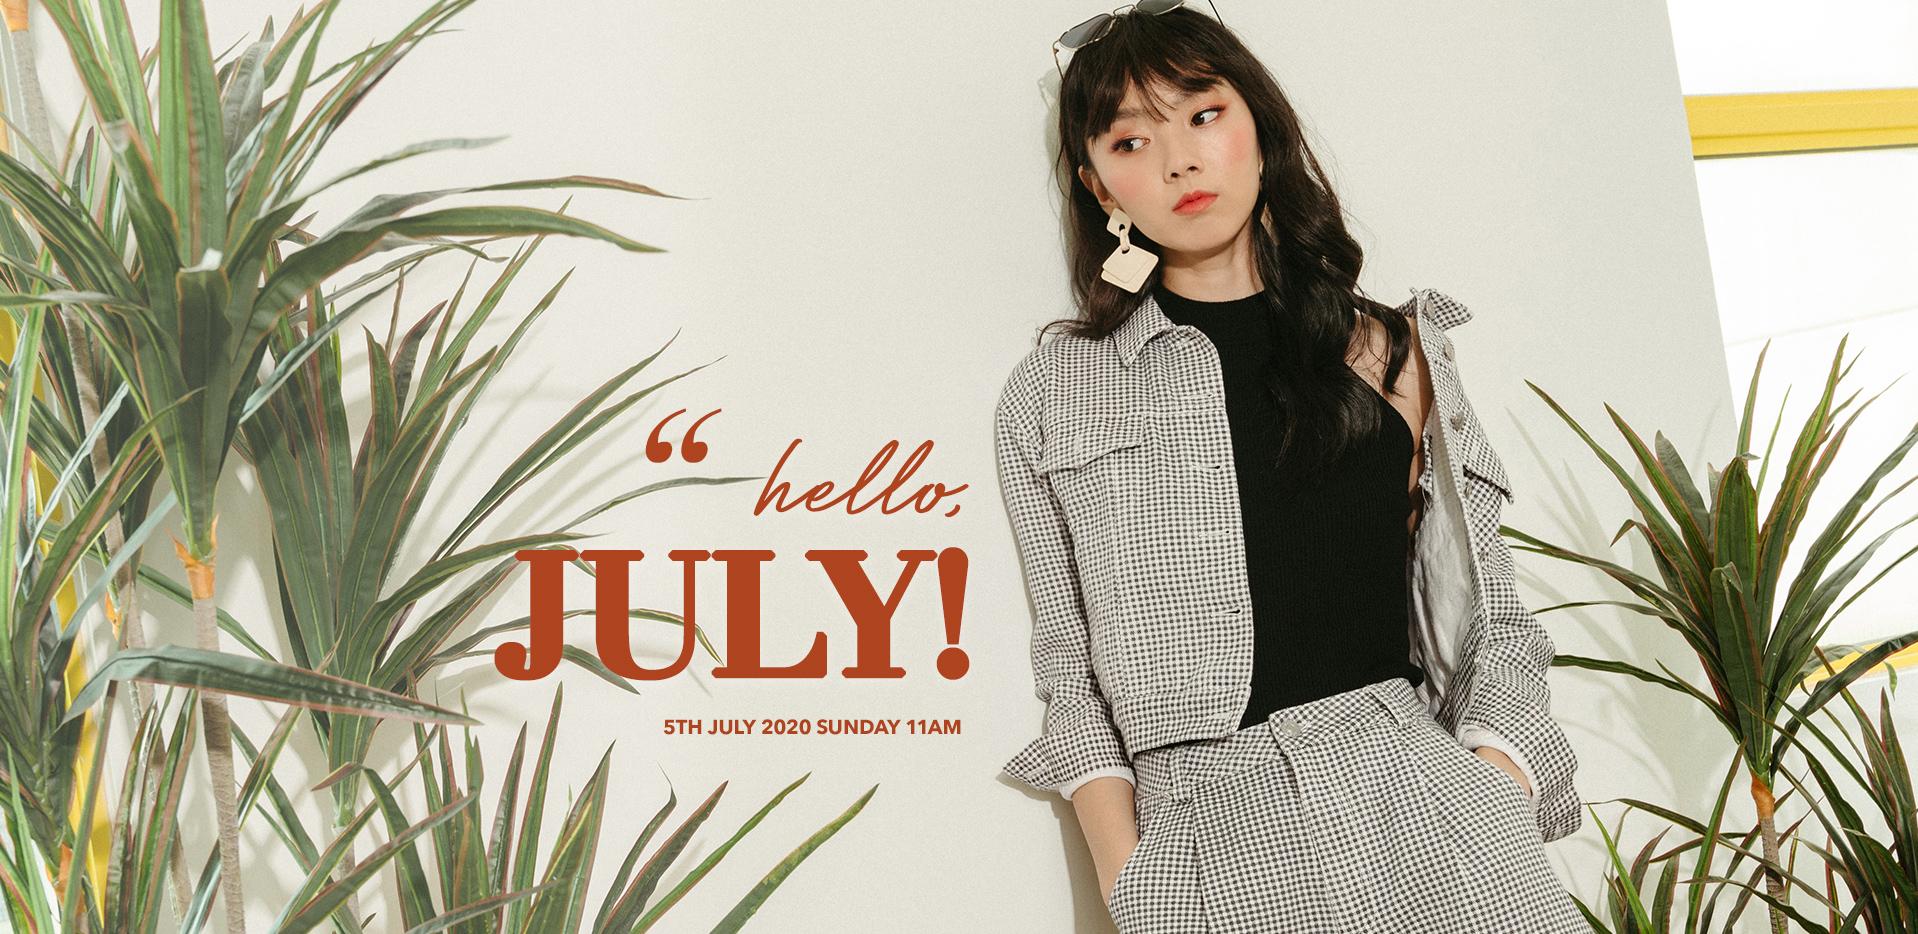 HELLO, JULY!